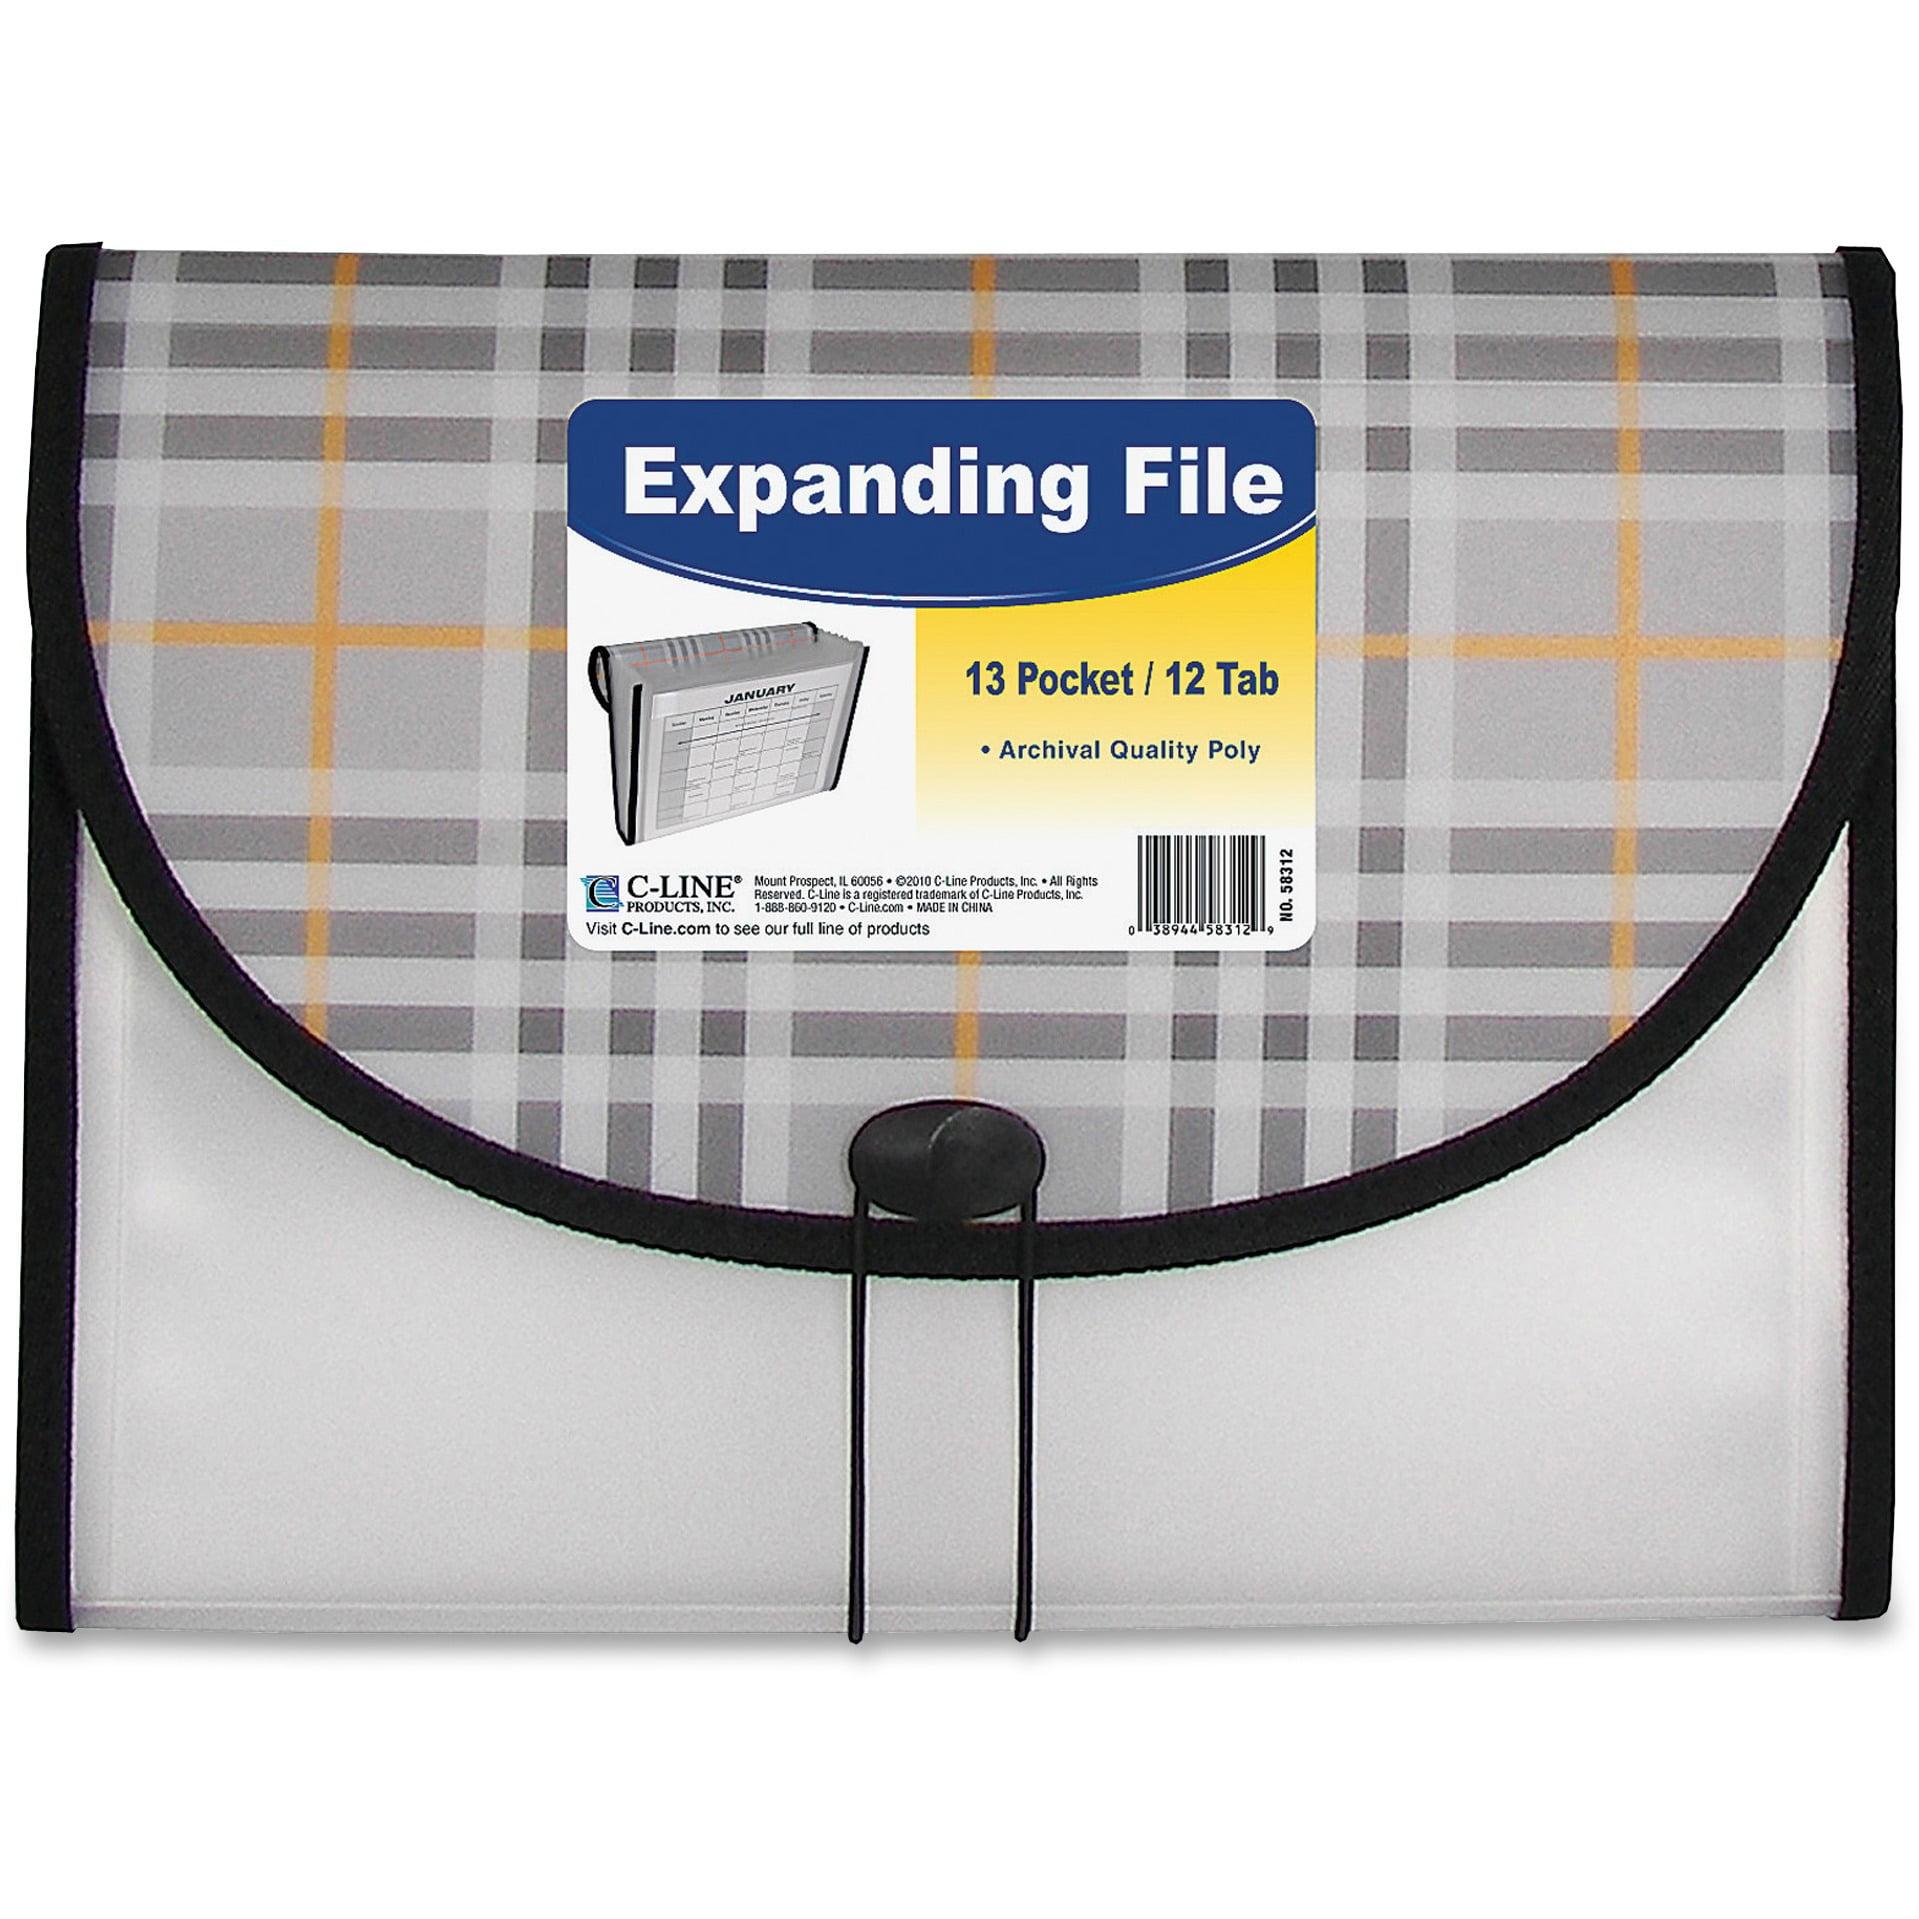 C-Line, CLI58312, 13-pocket Expanding File, 1 Each